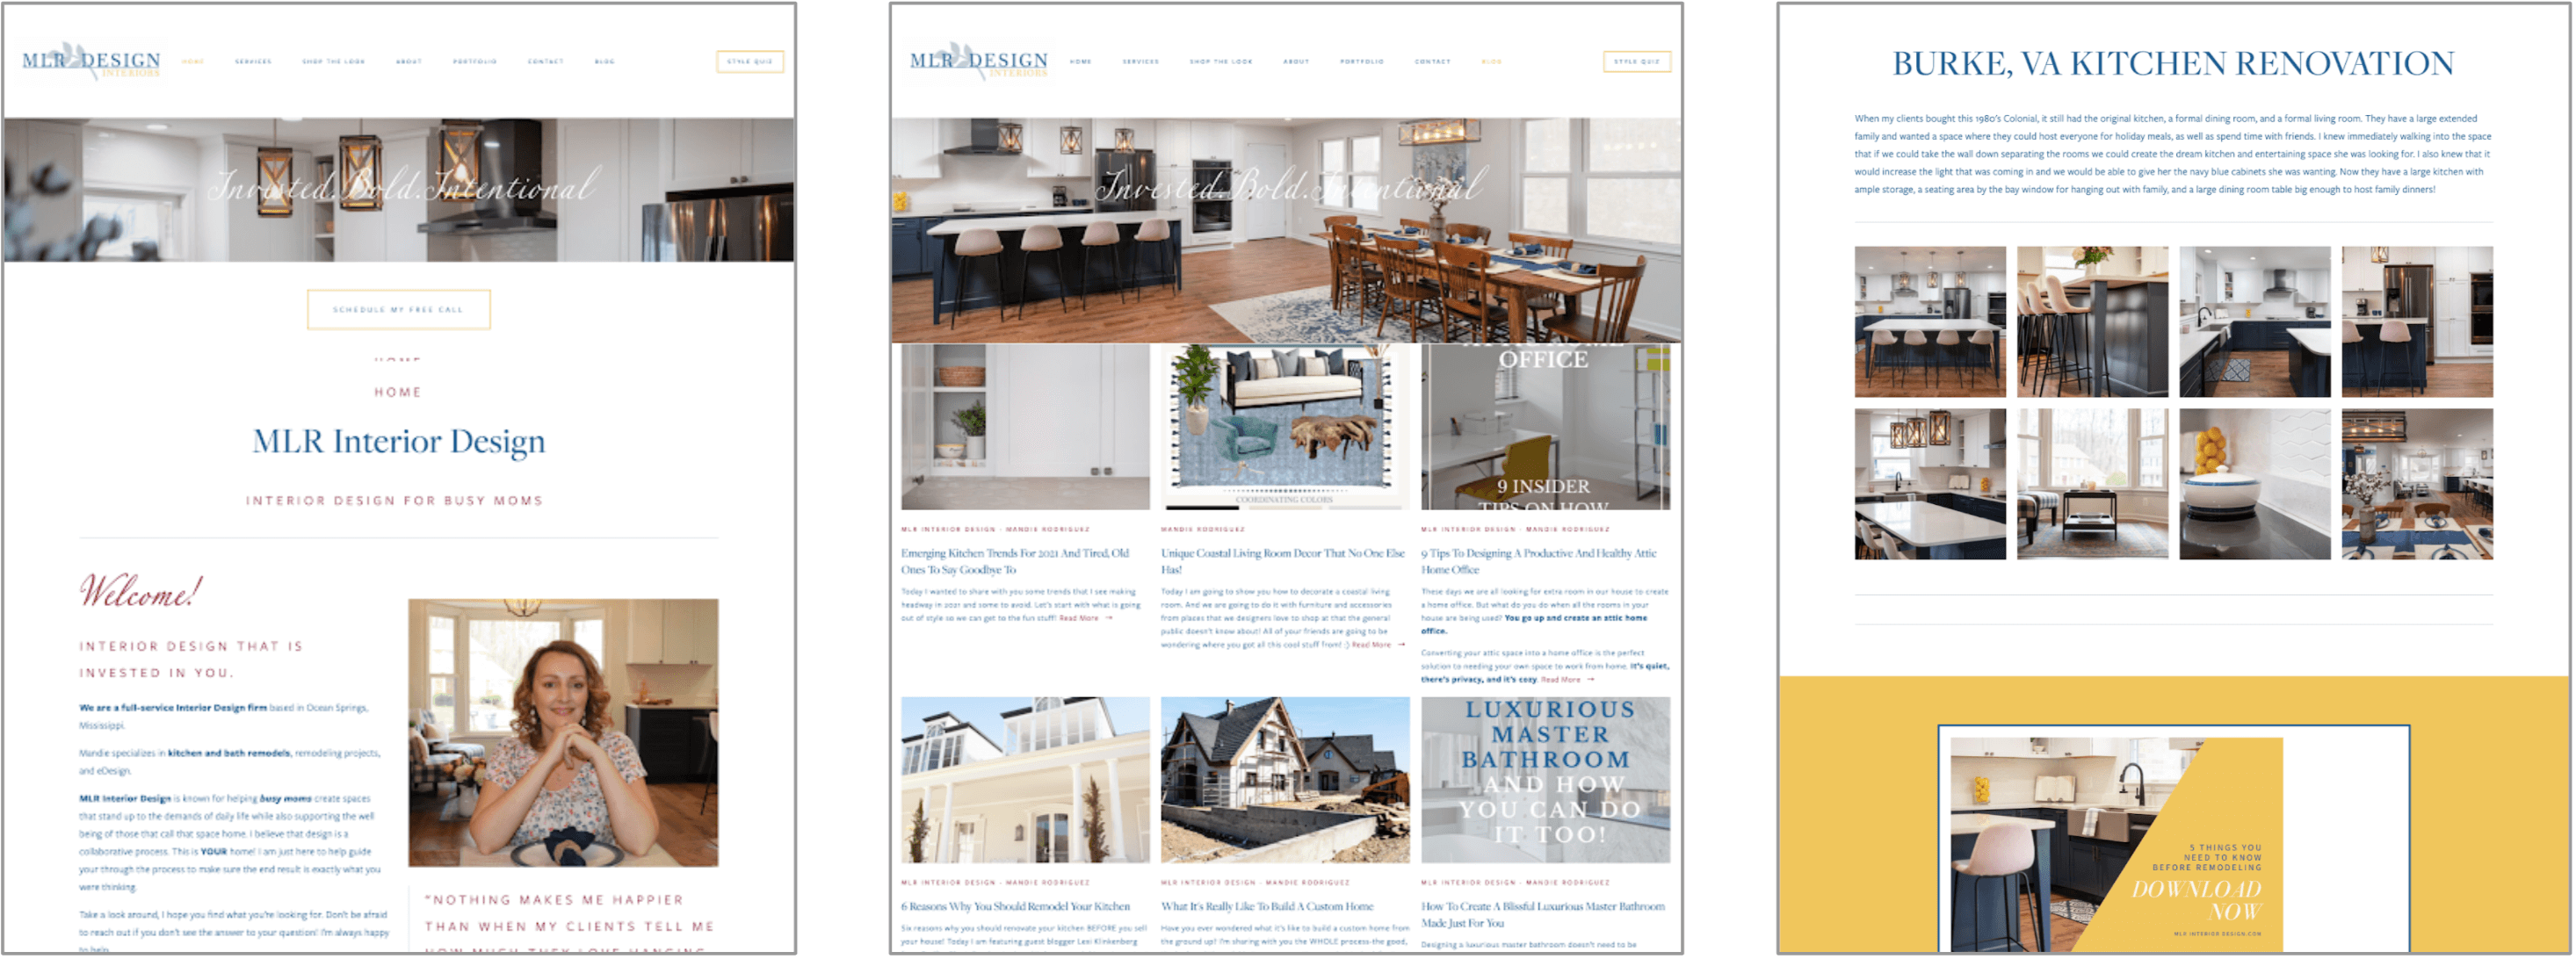 MLR Interior Design Website Design Before